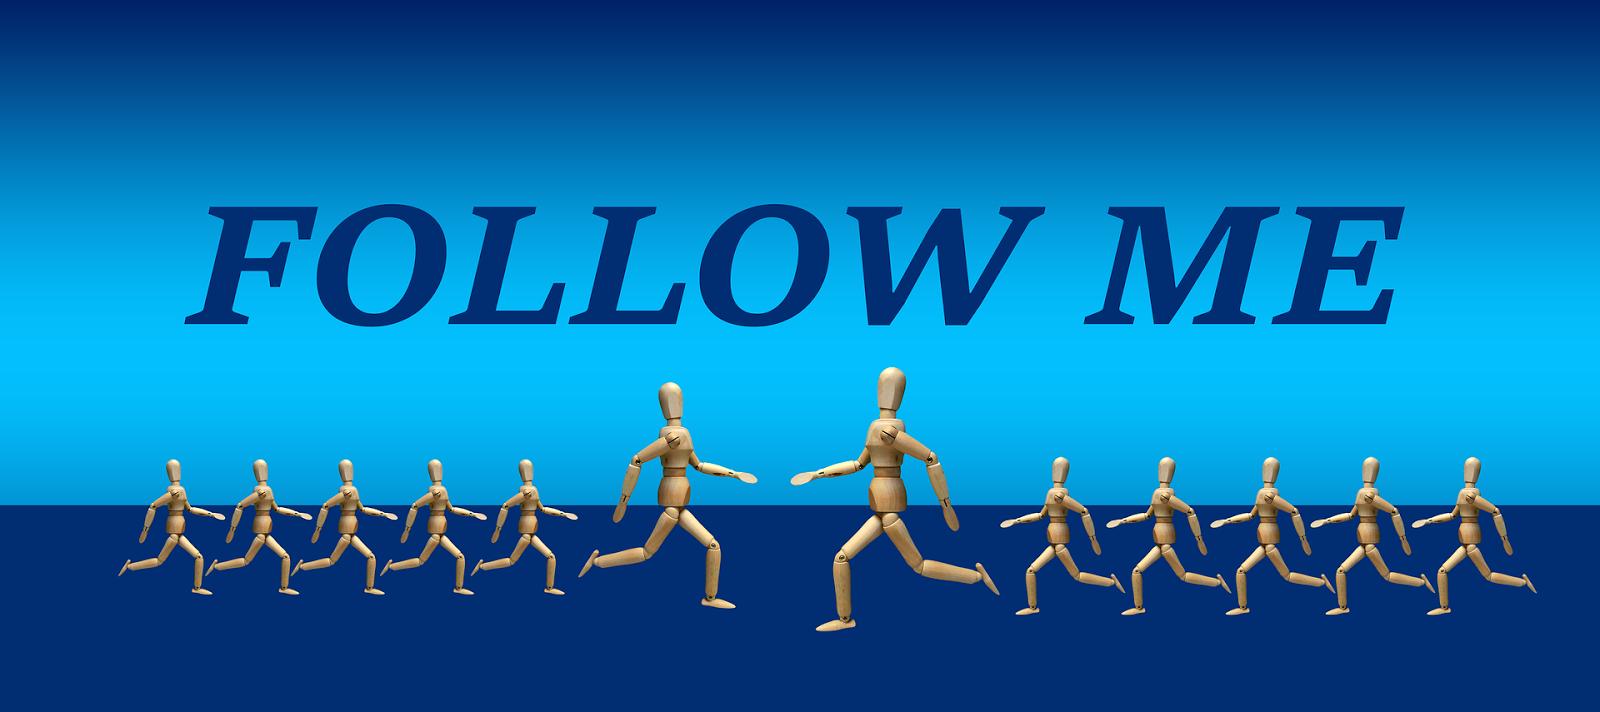 followme.png